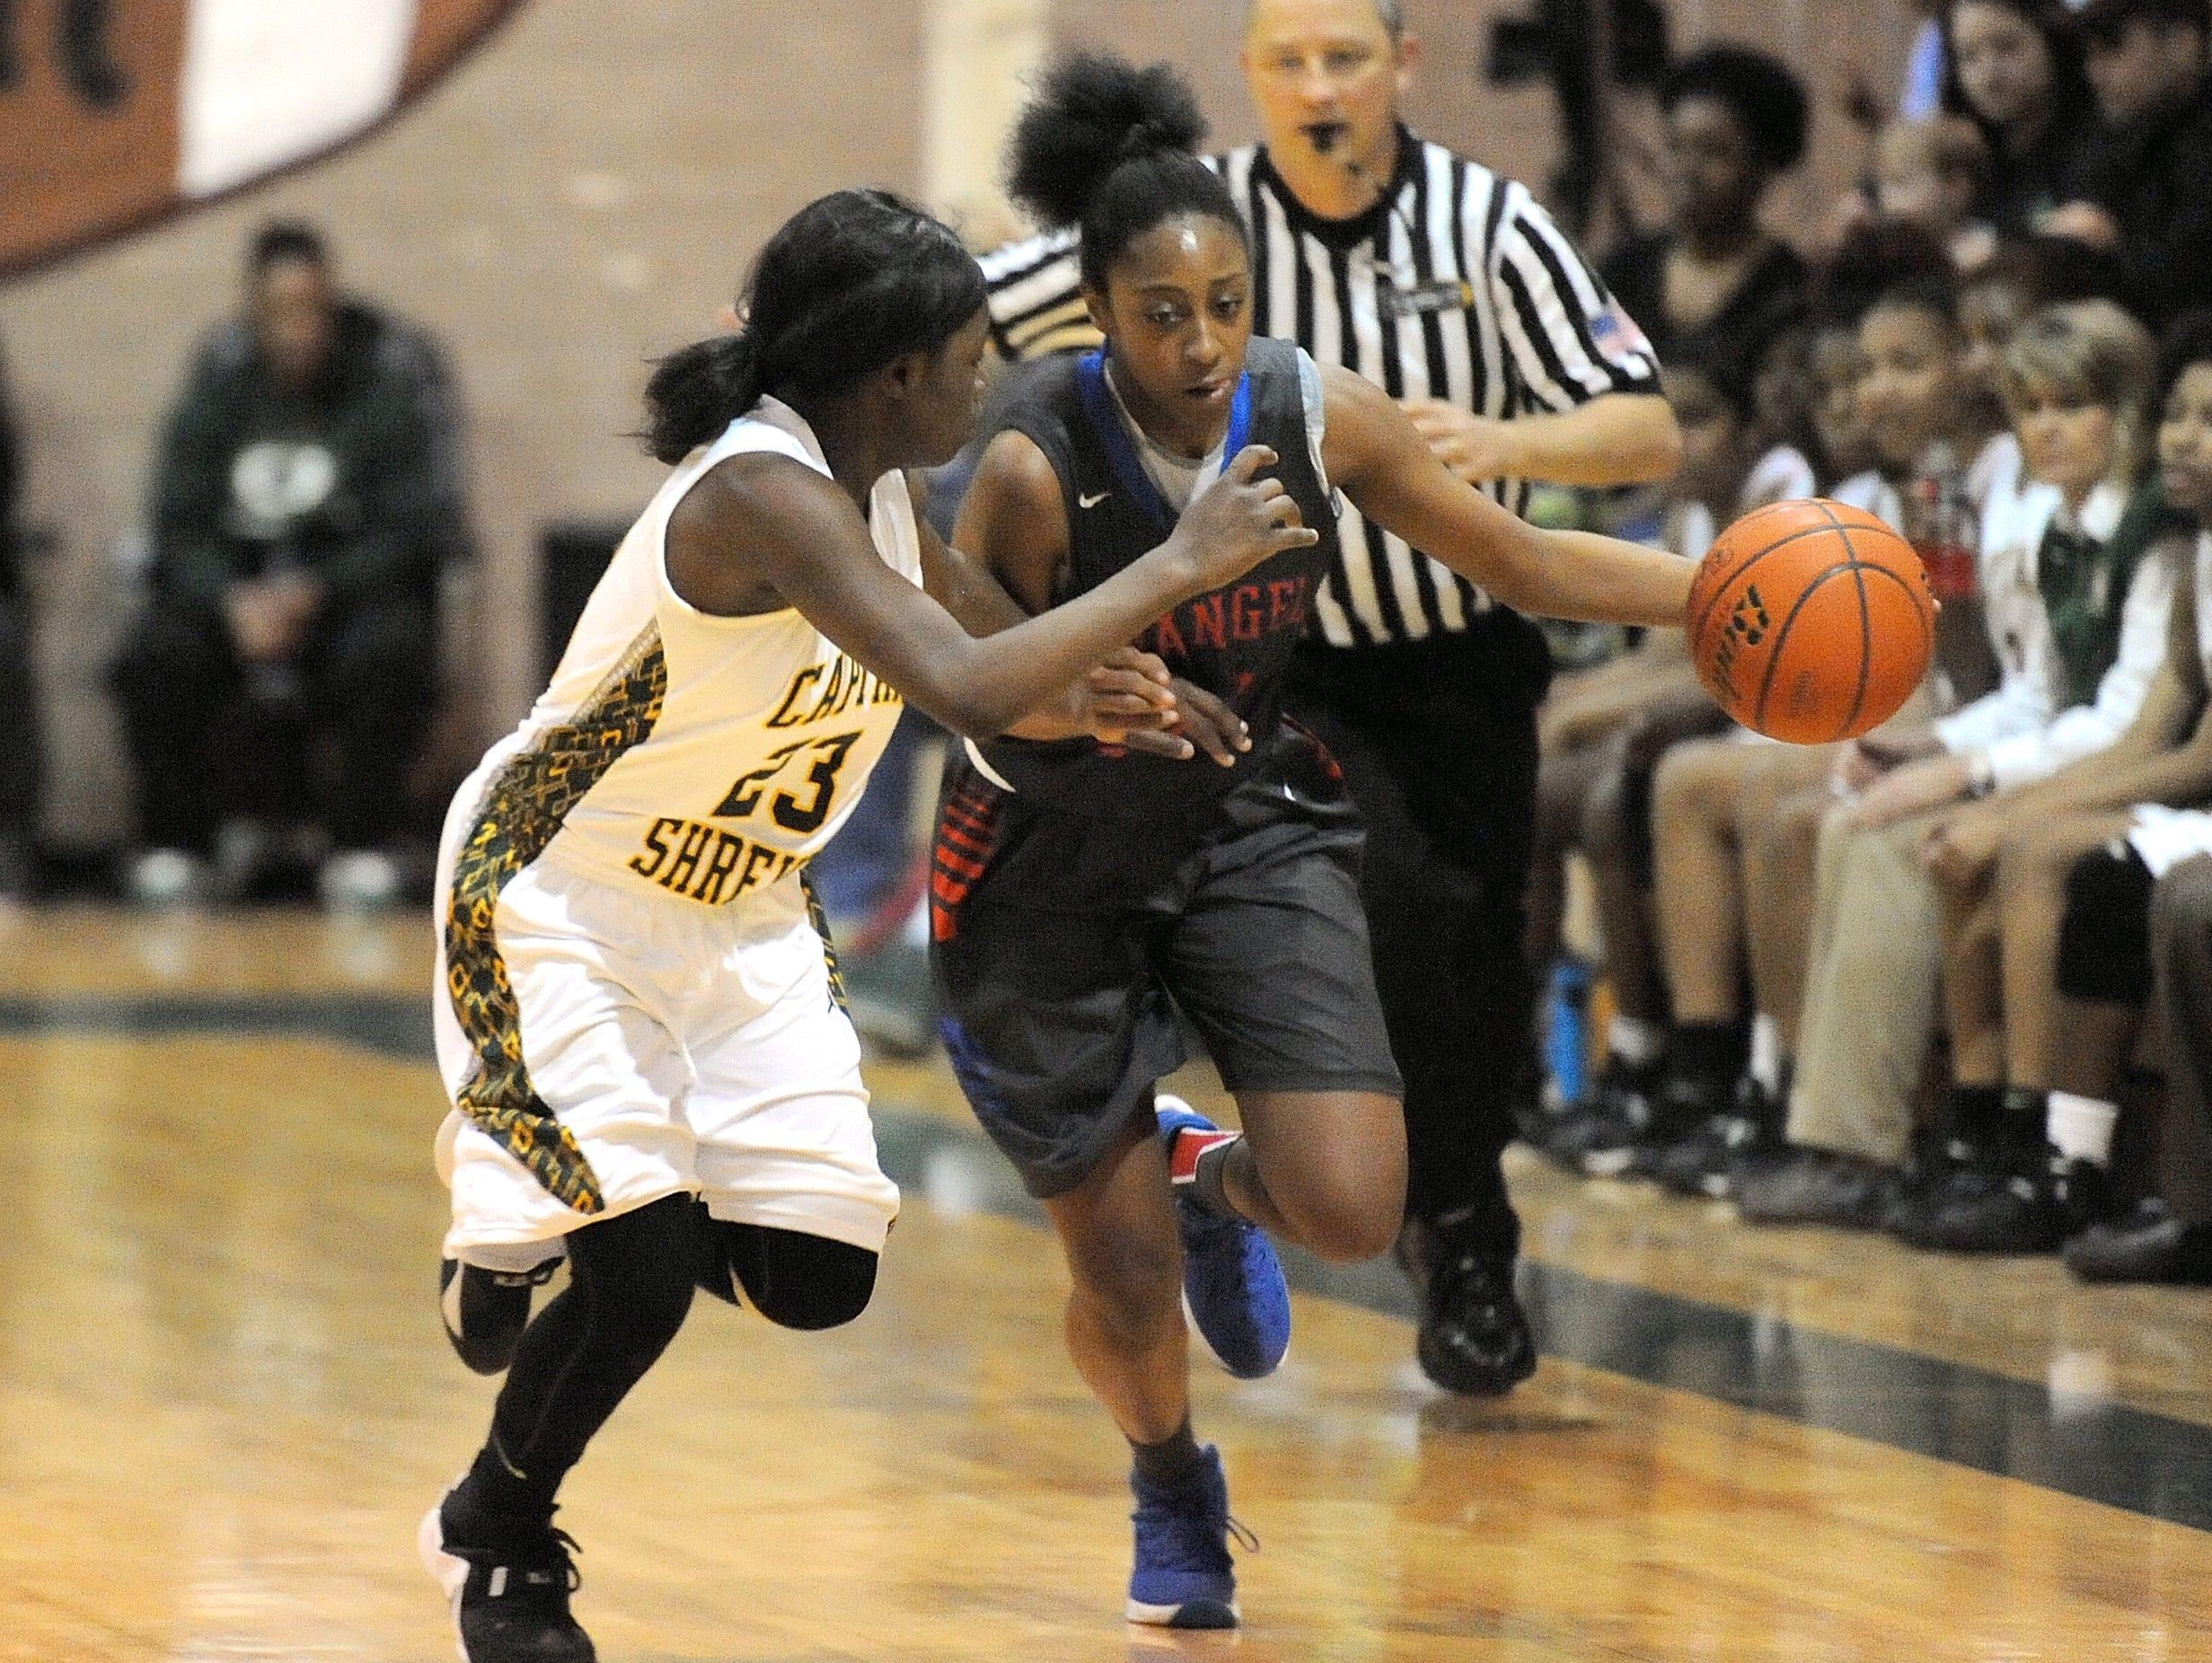 Evangel's Tiara Young drives to the basket last season.